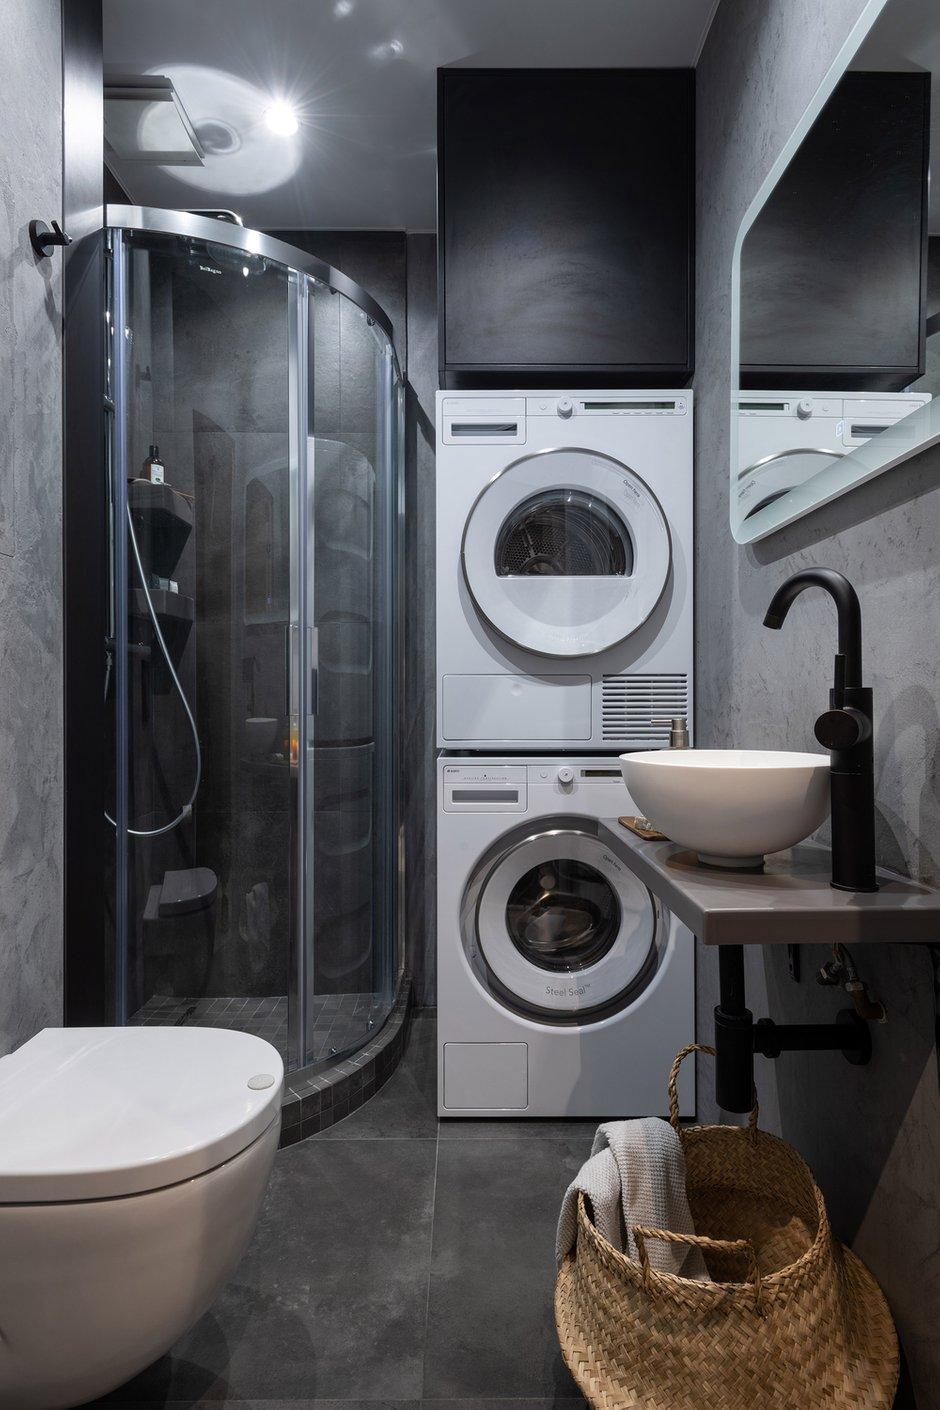 Фотография: Ванная в стиле Современный, Малогабаритная квартира, Квартира, Студия, Проект недели, Москва, Хрущевка, 1 комната, Huge Studio – фото на INMYROOM